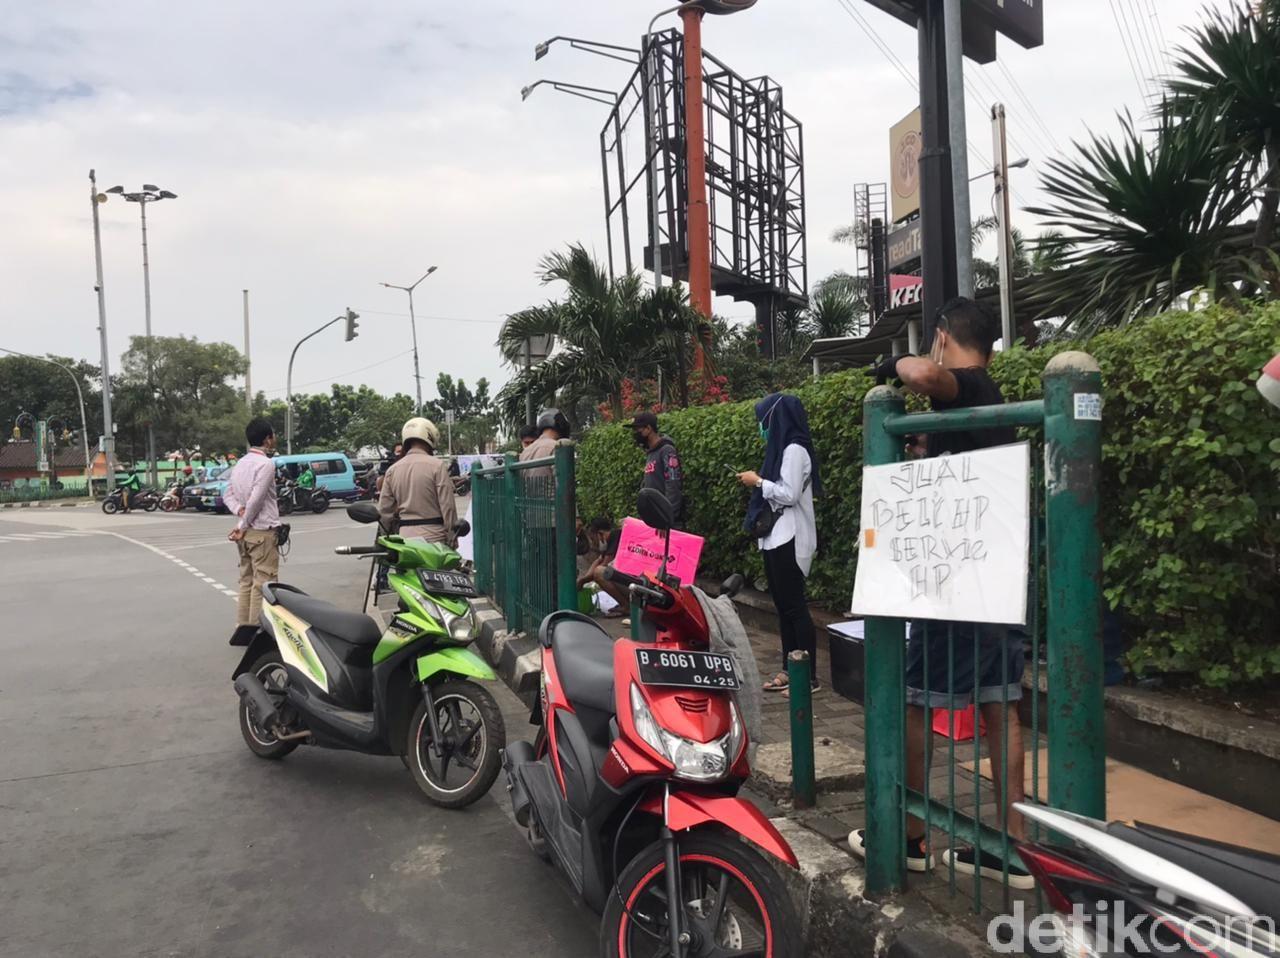 Sulit Bayar Sewa Toko, Tukang Service Handphone Pindah ke Jalan